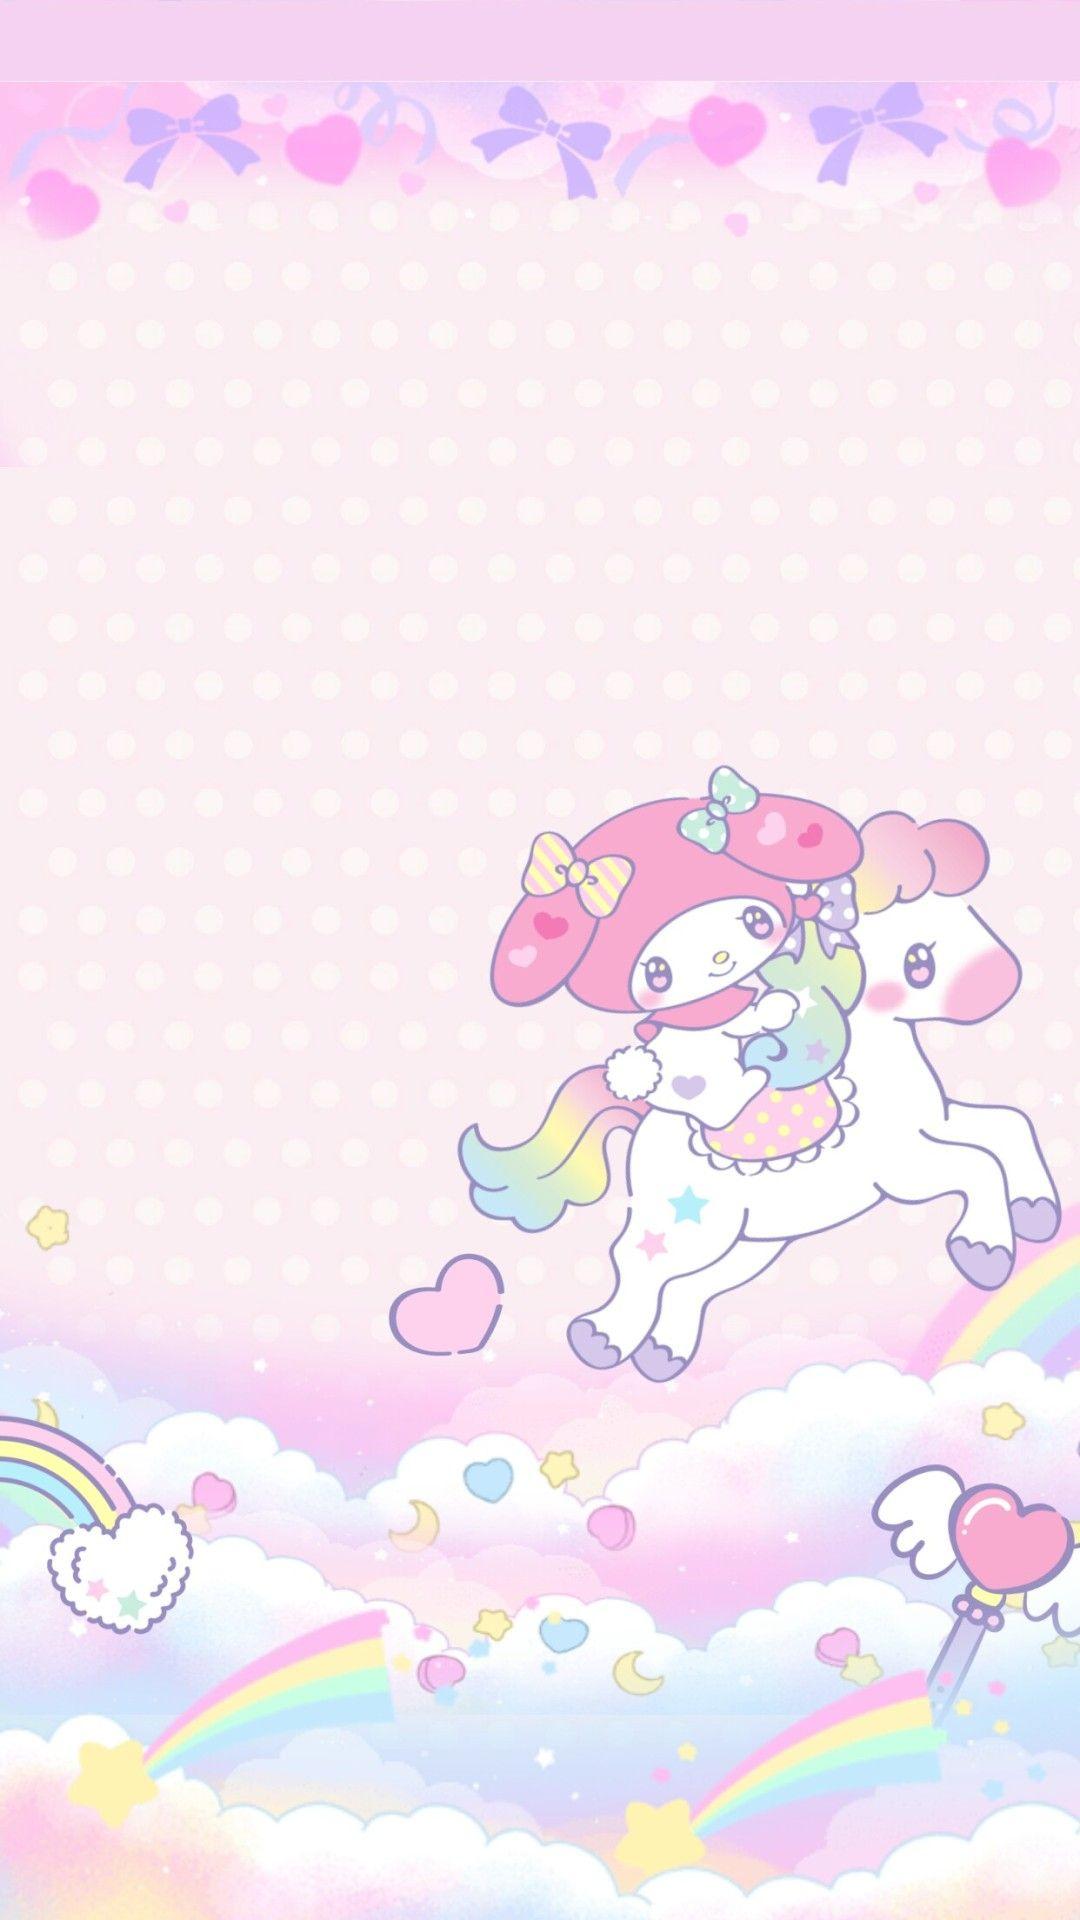 𝙹𝚎𝚗𝚗𝚕𝚘𝚟𝚎 Heymi243 My Melody Unicorn Wallpaper By Me